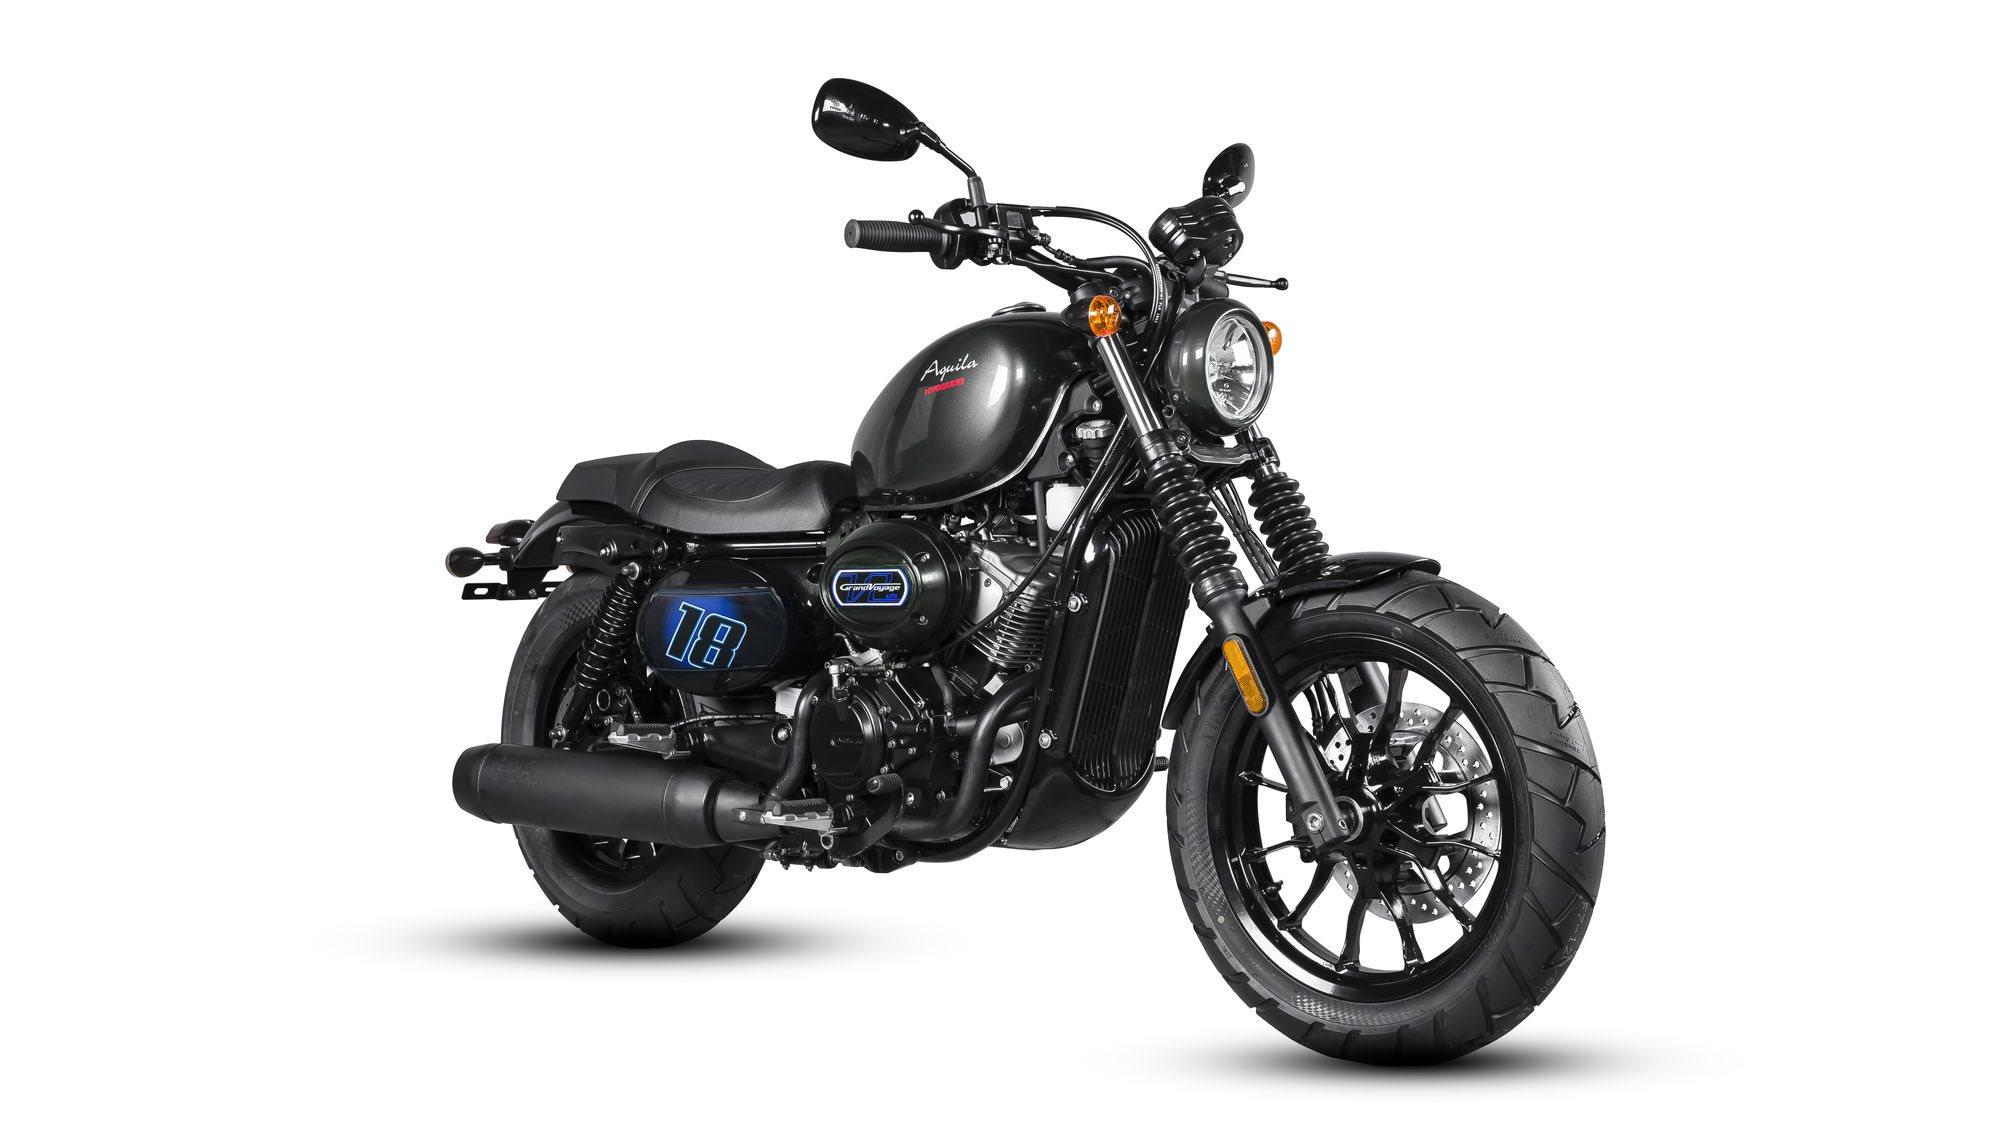 Hyosung Aquila GV 125 Cruiser Motorrad, neu